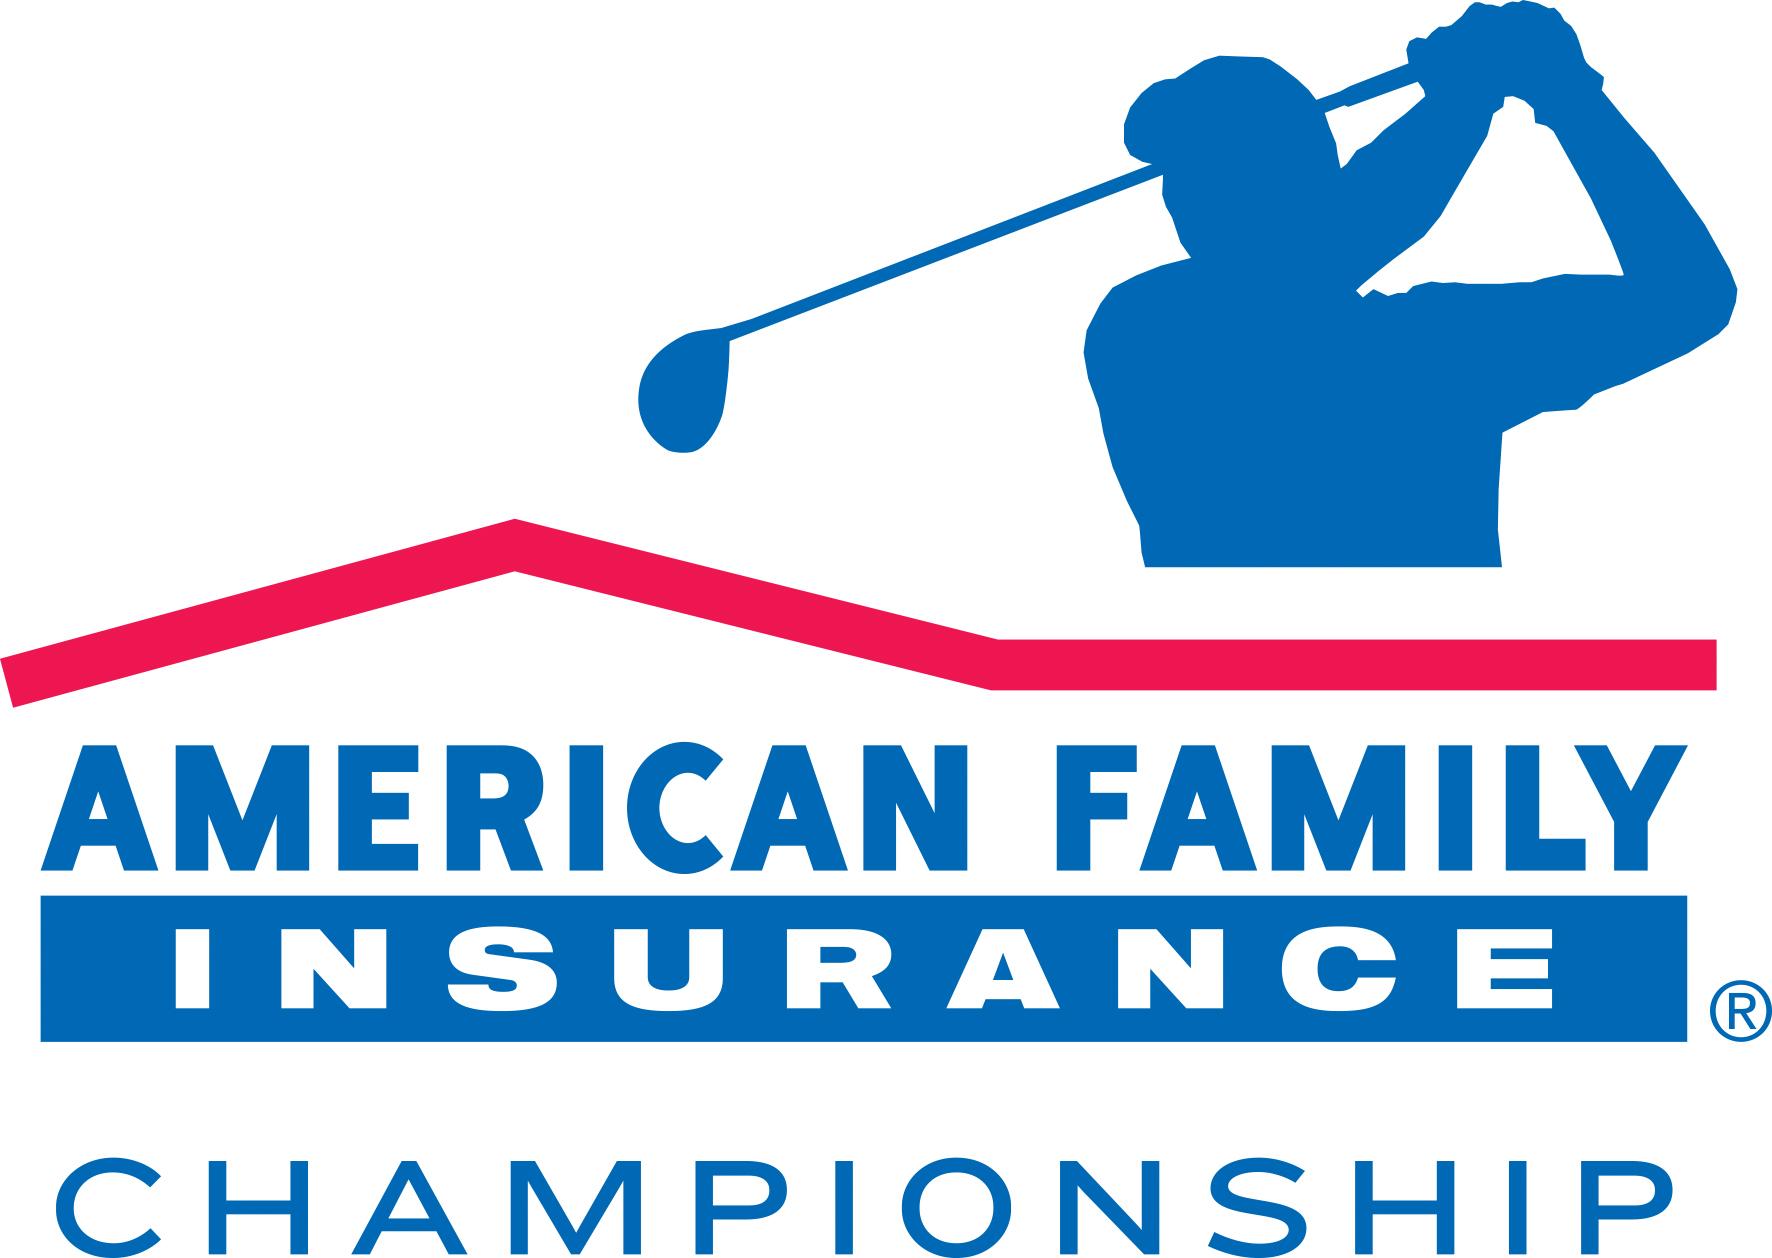 american family insurance championship photo - 1